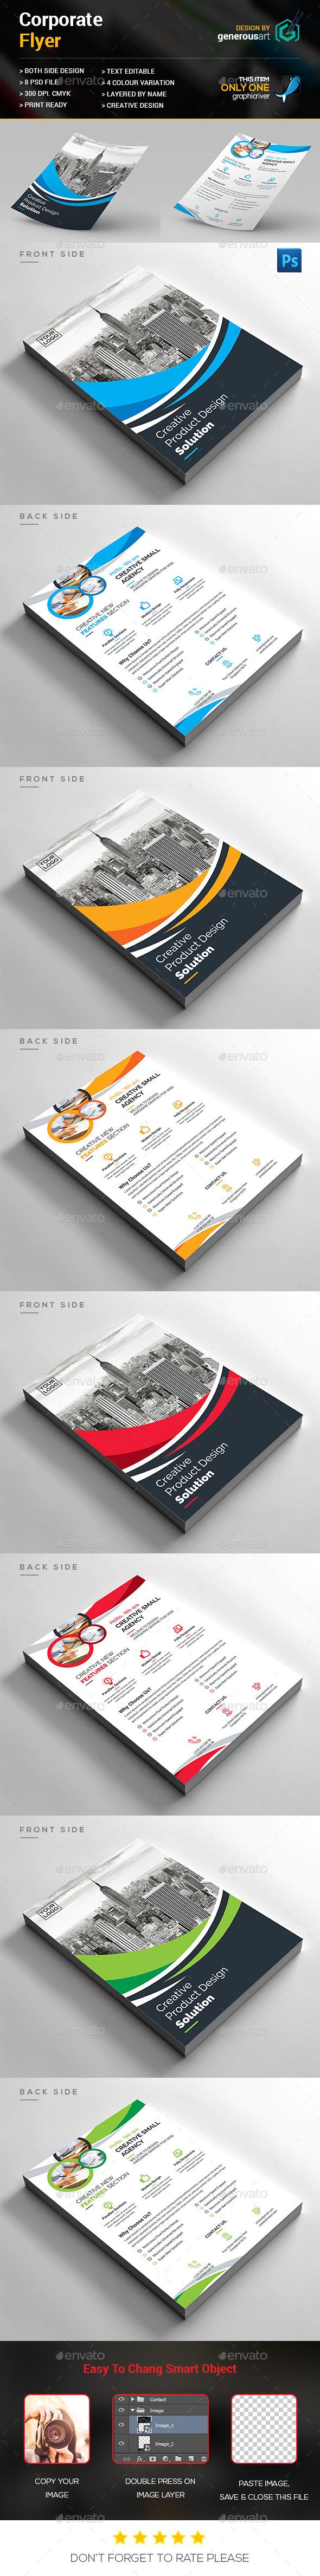 Creative Corporate Flyer - Corporate Flyers